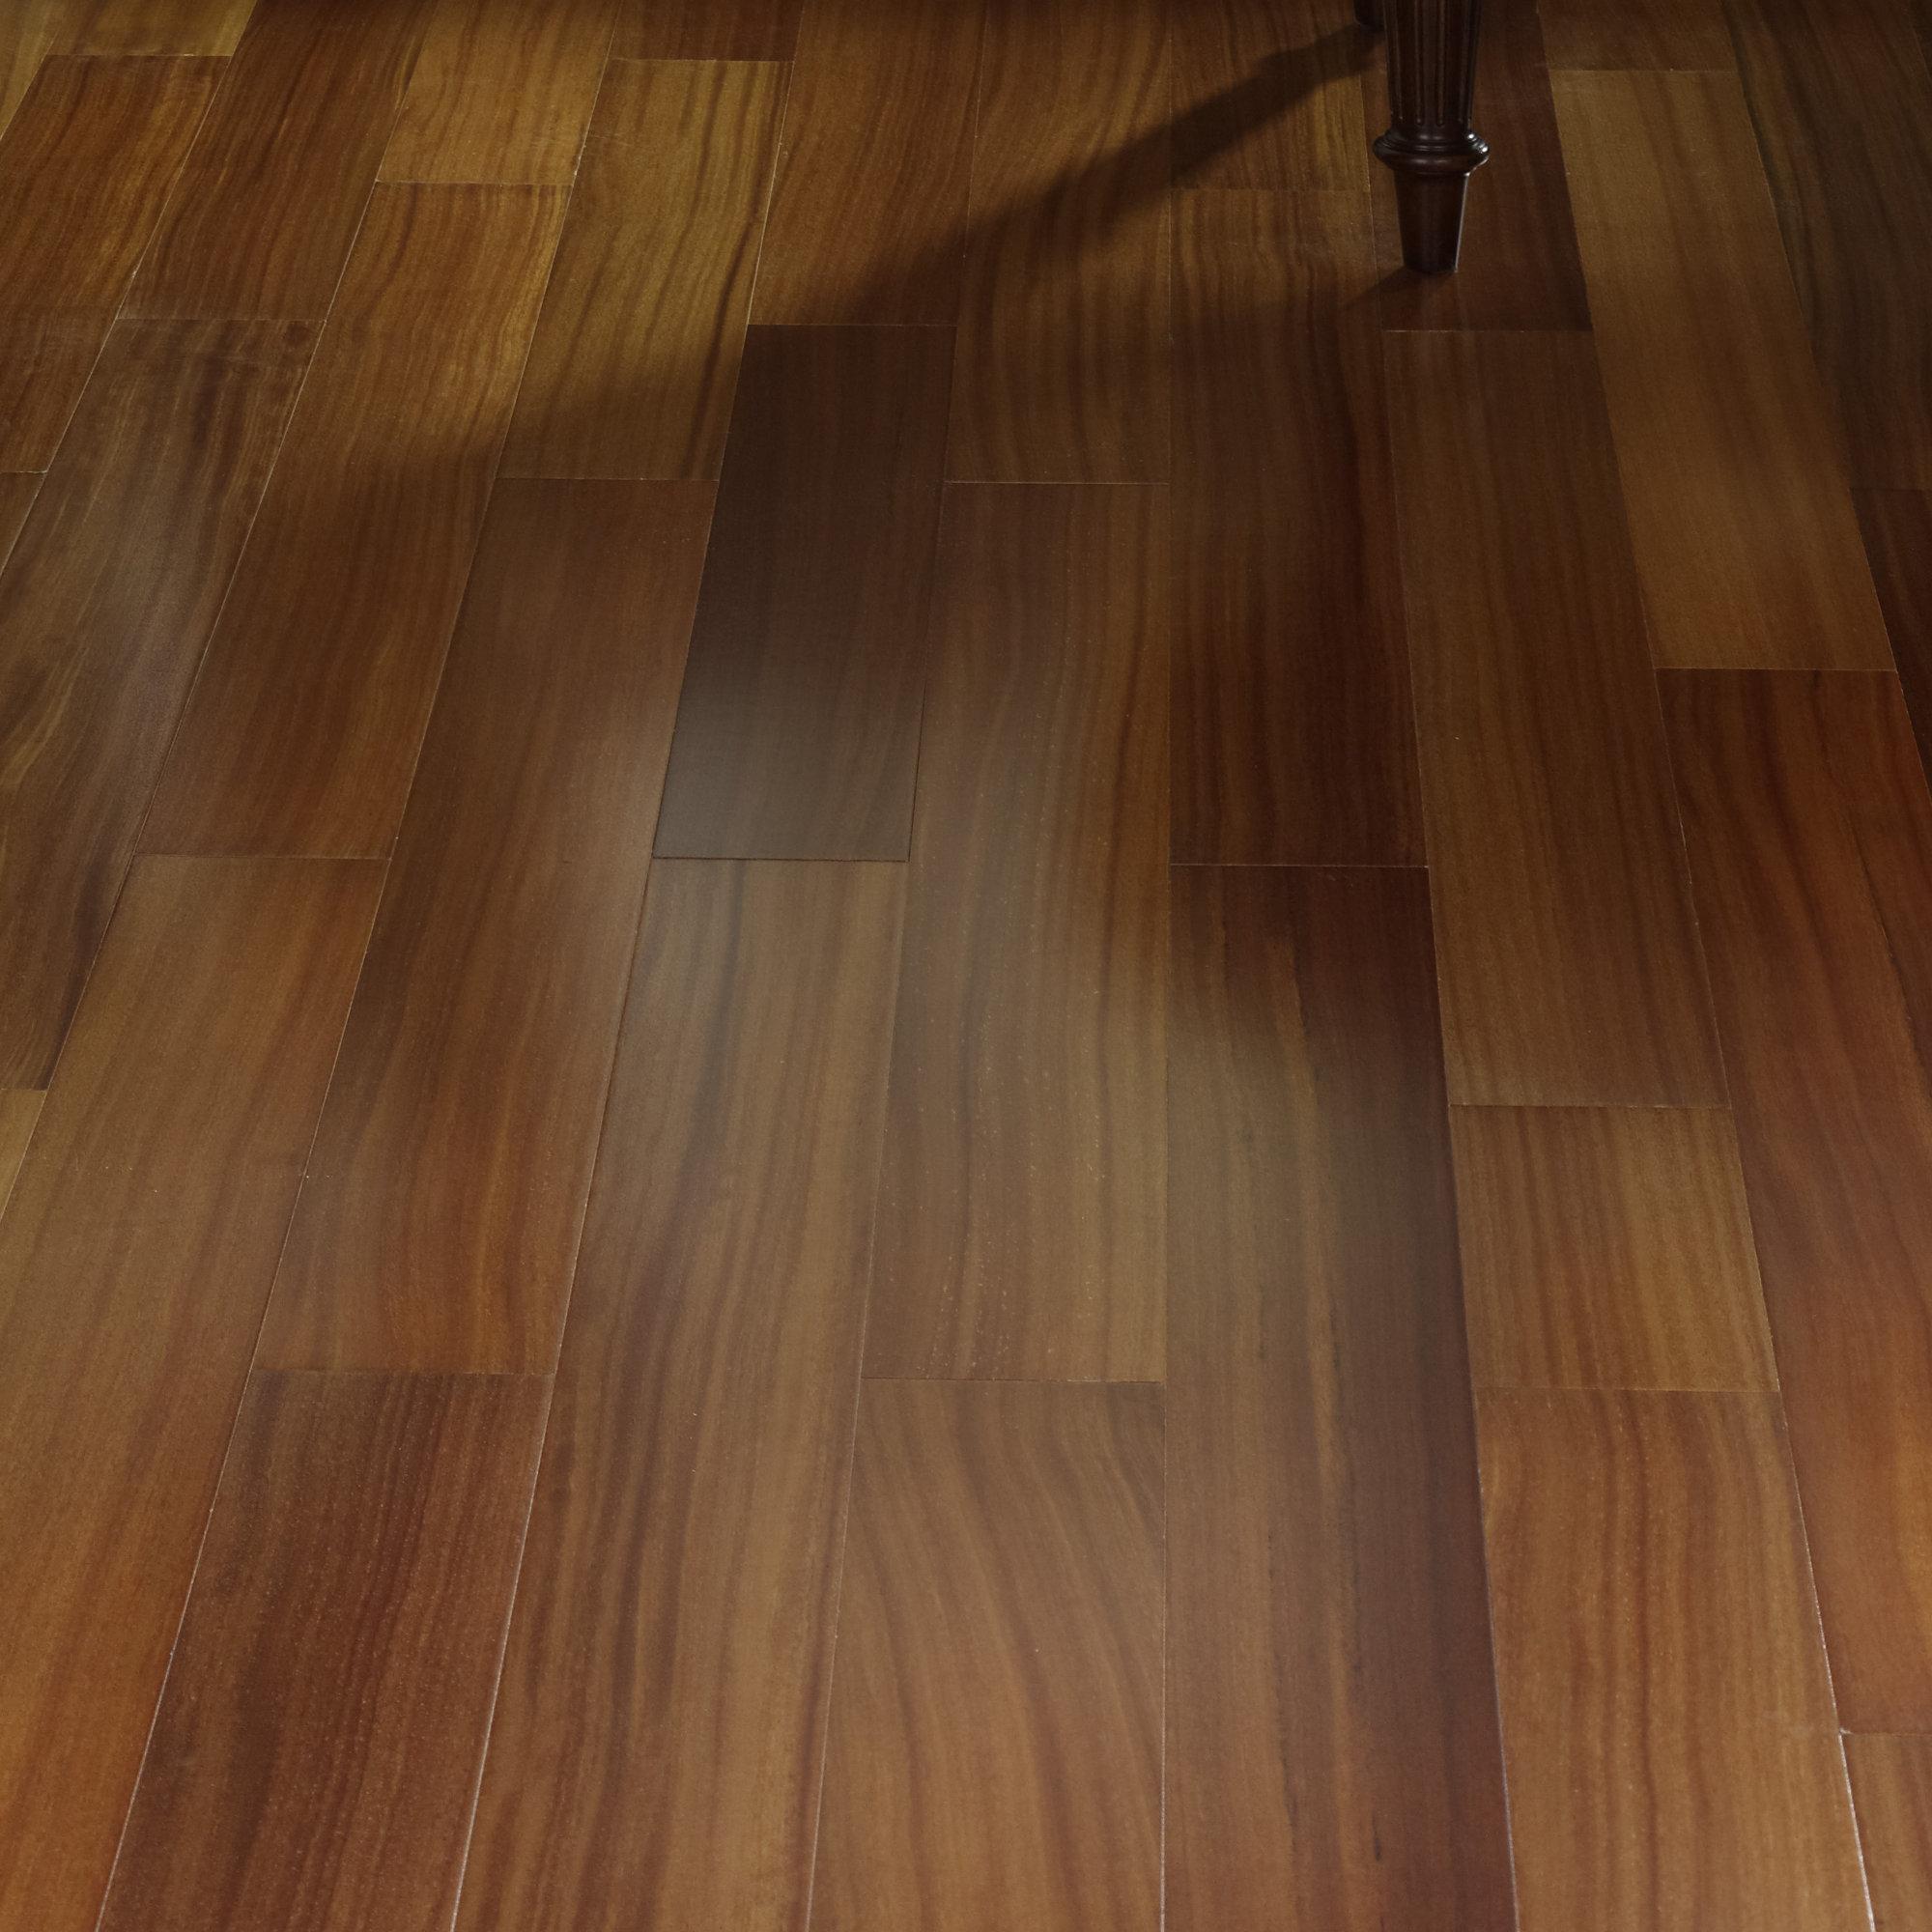 Brazilian Teak Hardwood Flooring Meze Blog